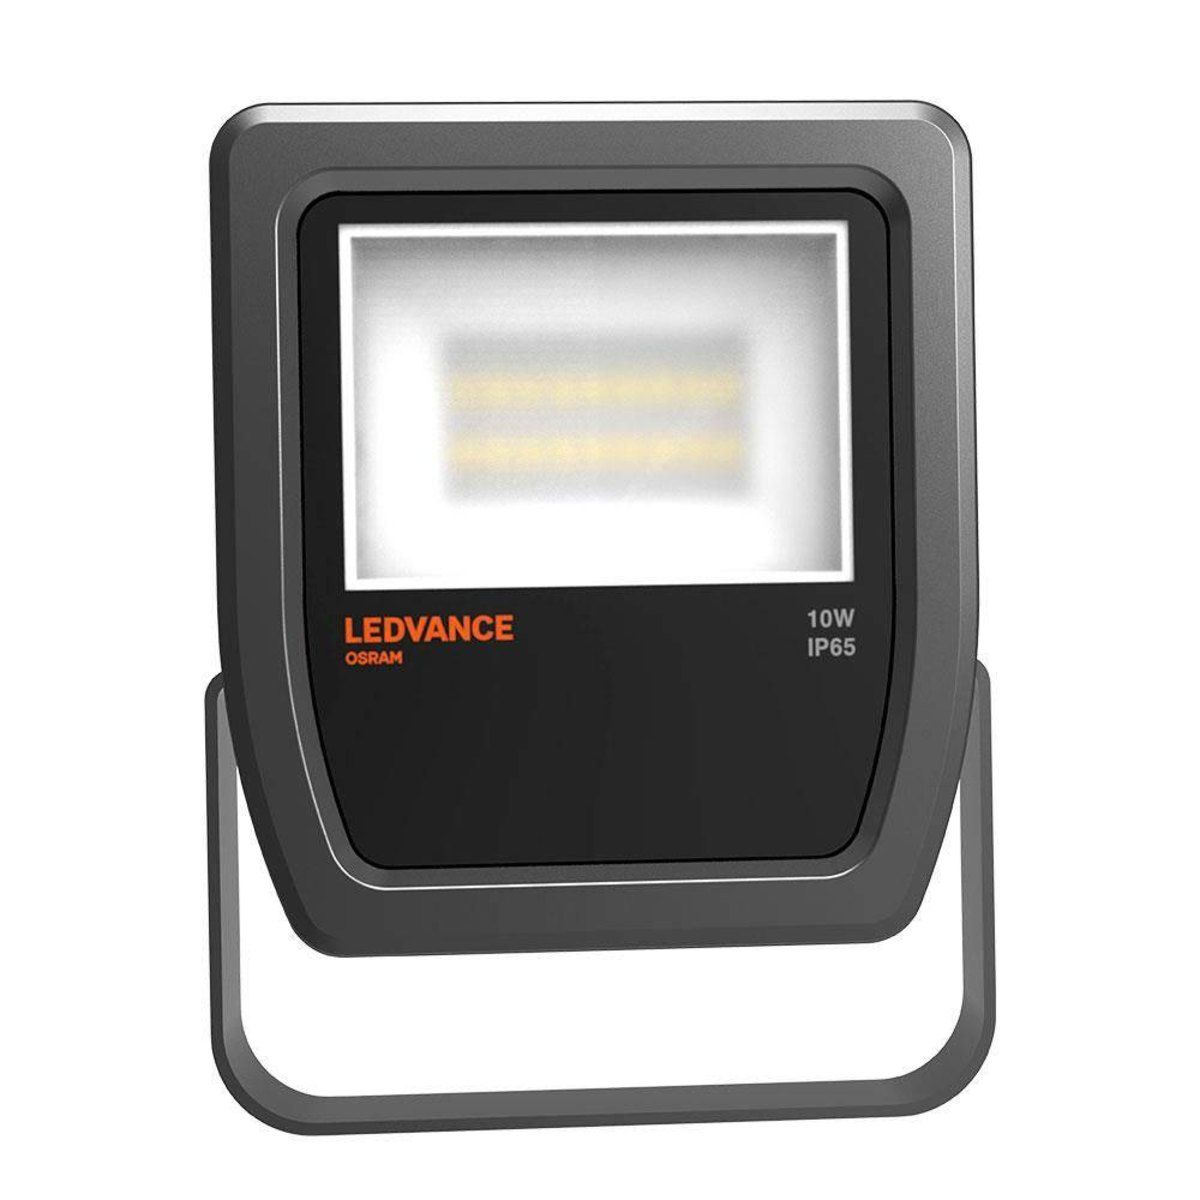 Refletor de LED IP65 10W 6500K - Ledvance